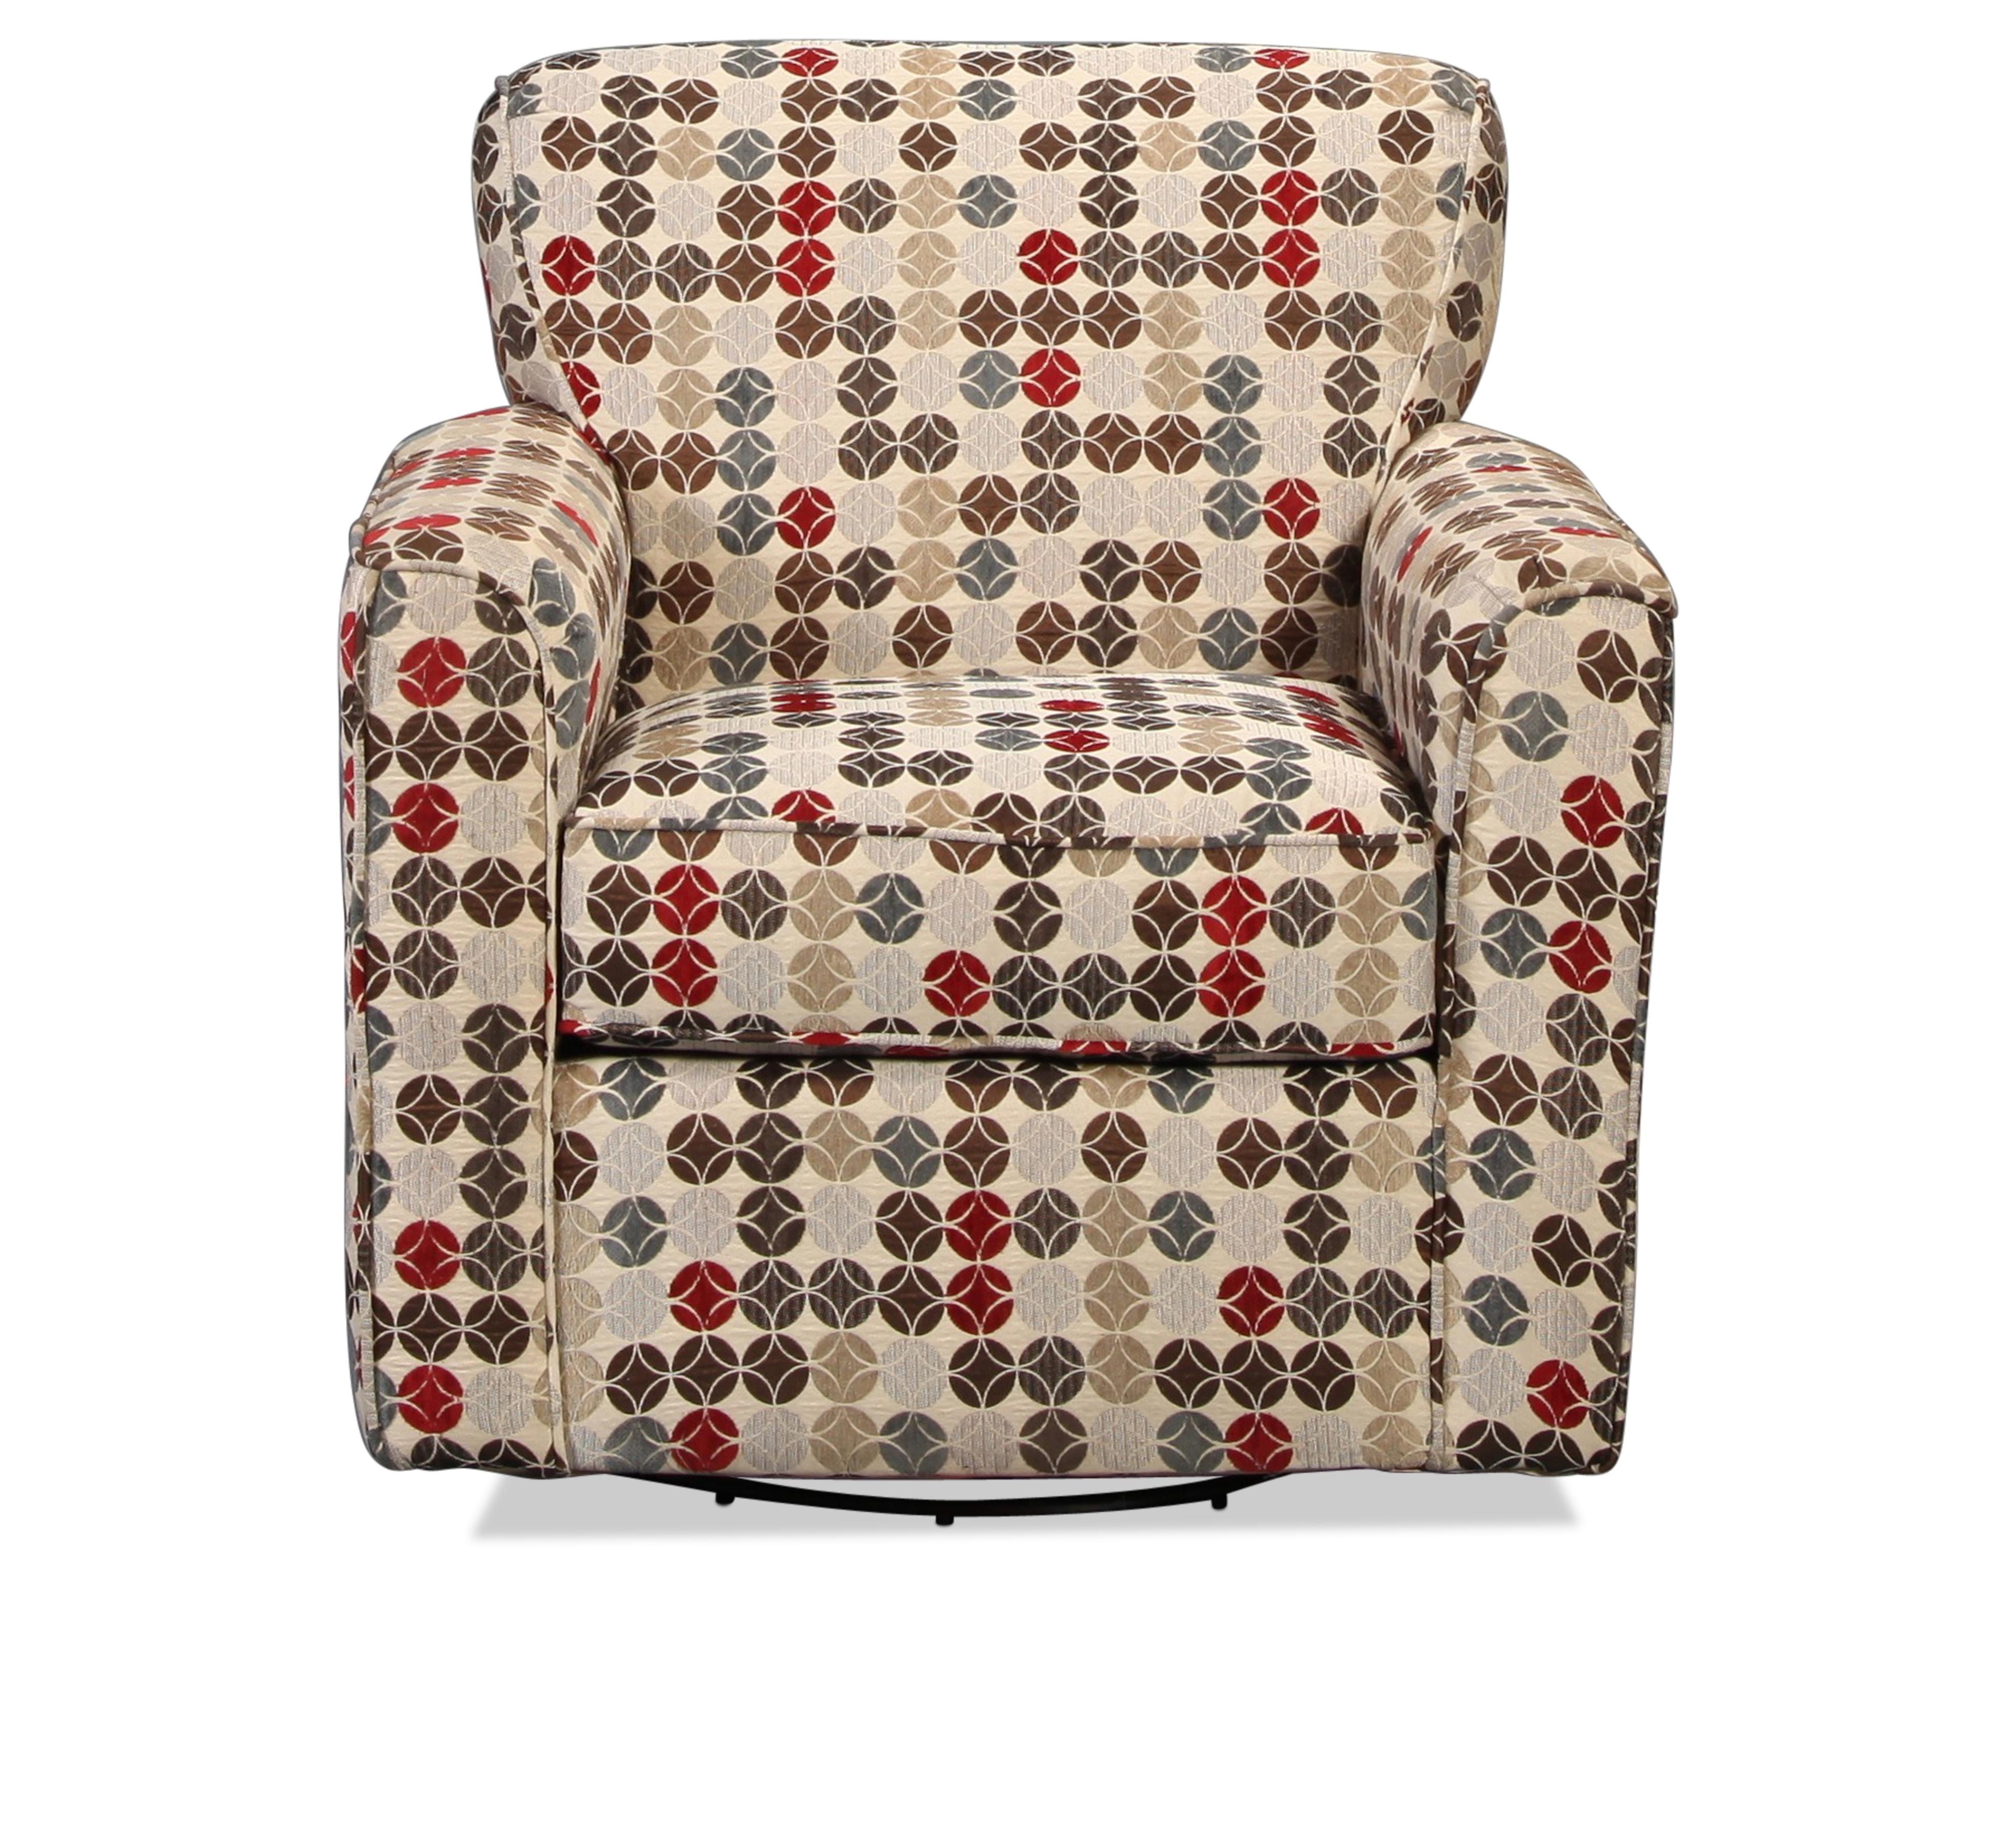 Canoga Swivel Glider Chair - Geometric